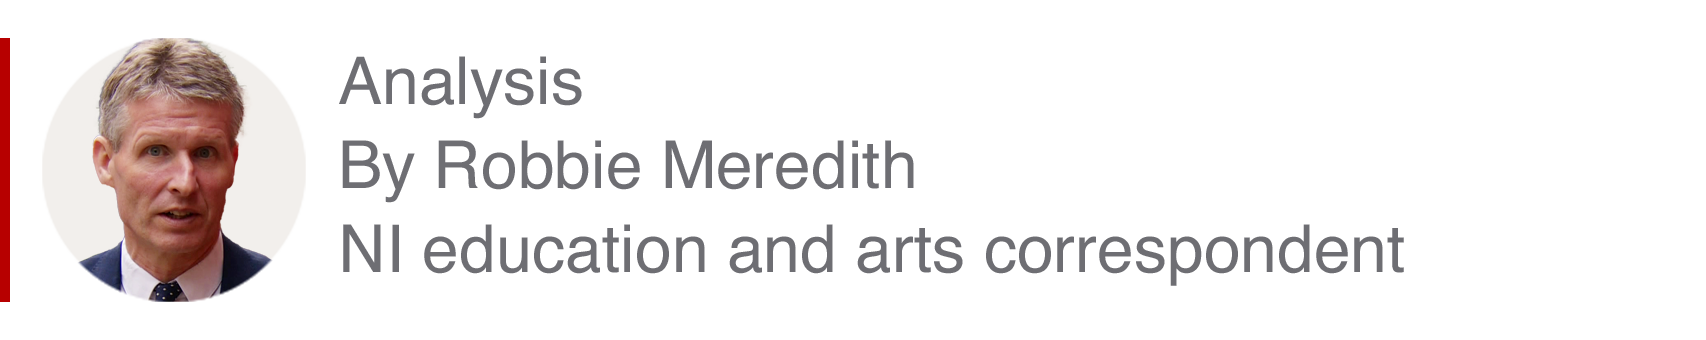 Analysis box by Robbie Meredith, NI education and arts correspondent